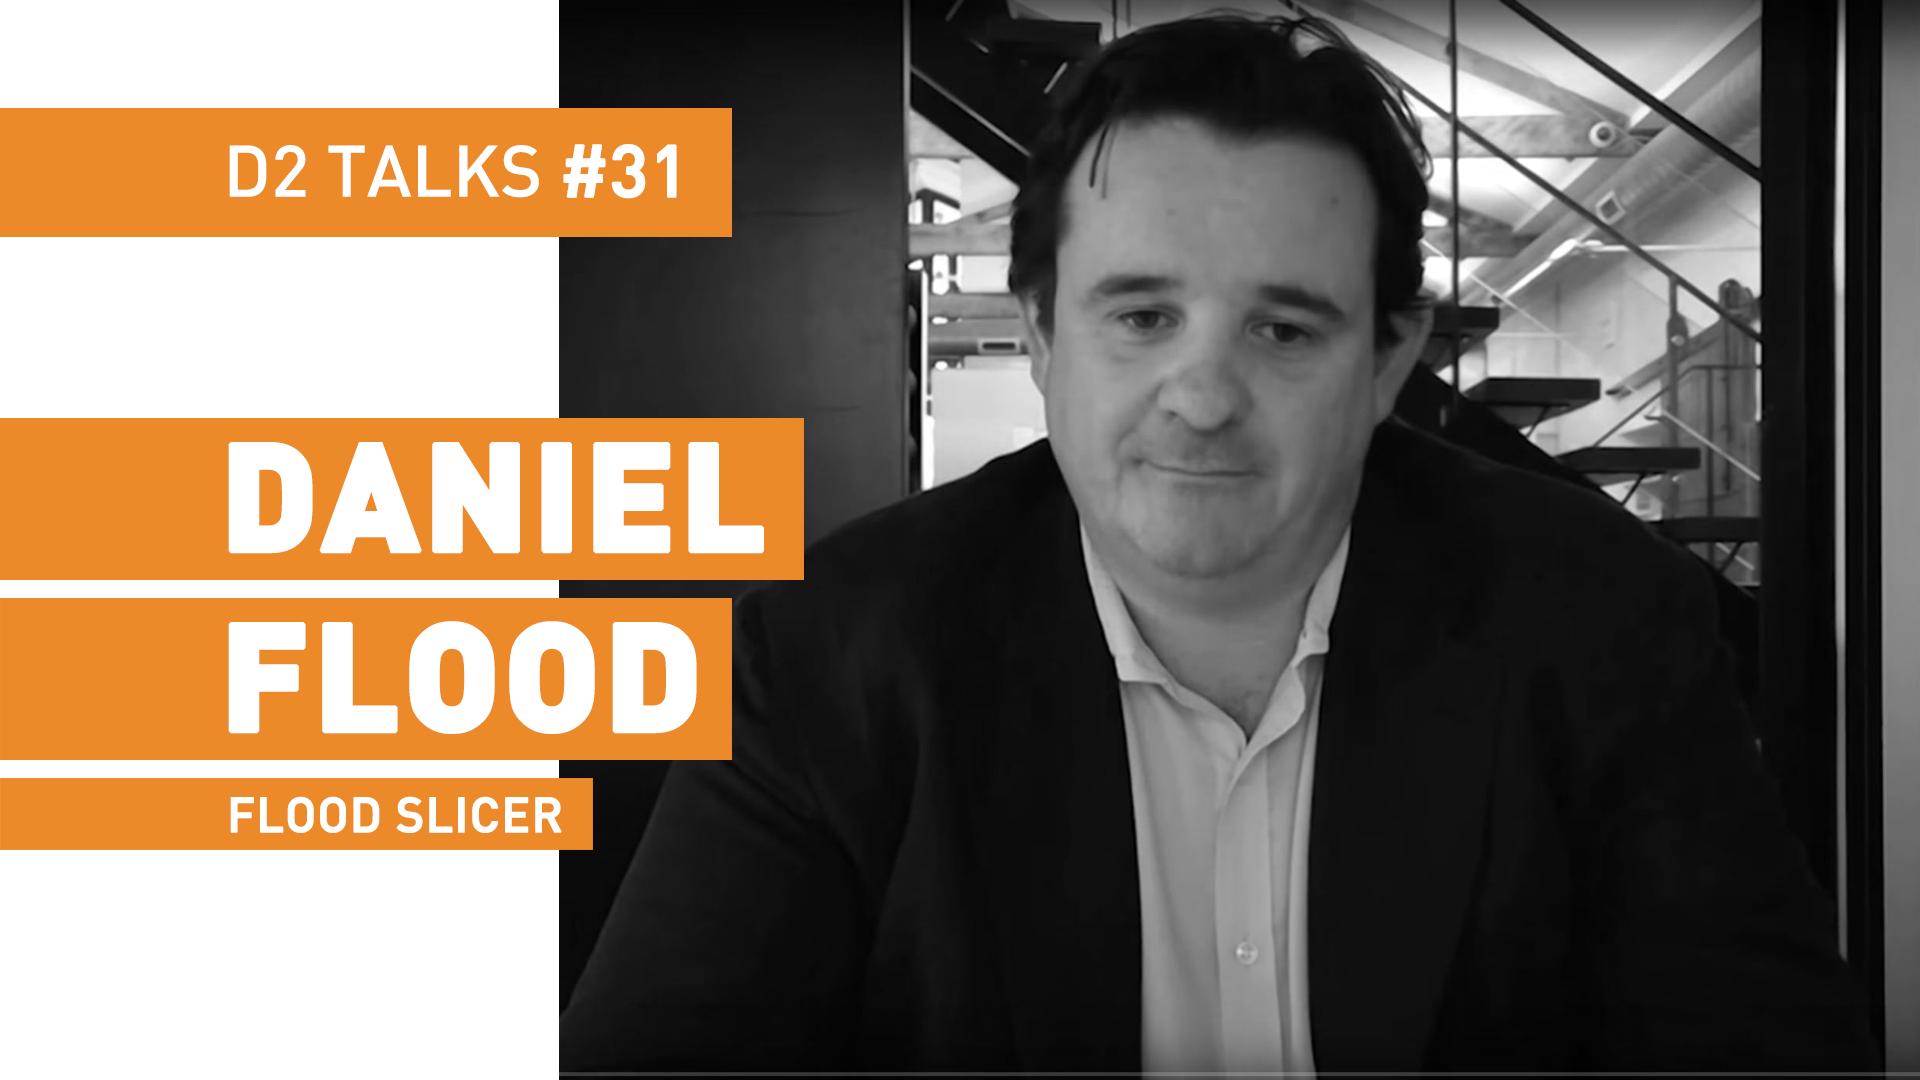 D2 Talks #31: Daniel Flood of FloodSlicer